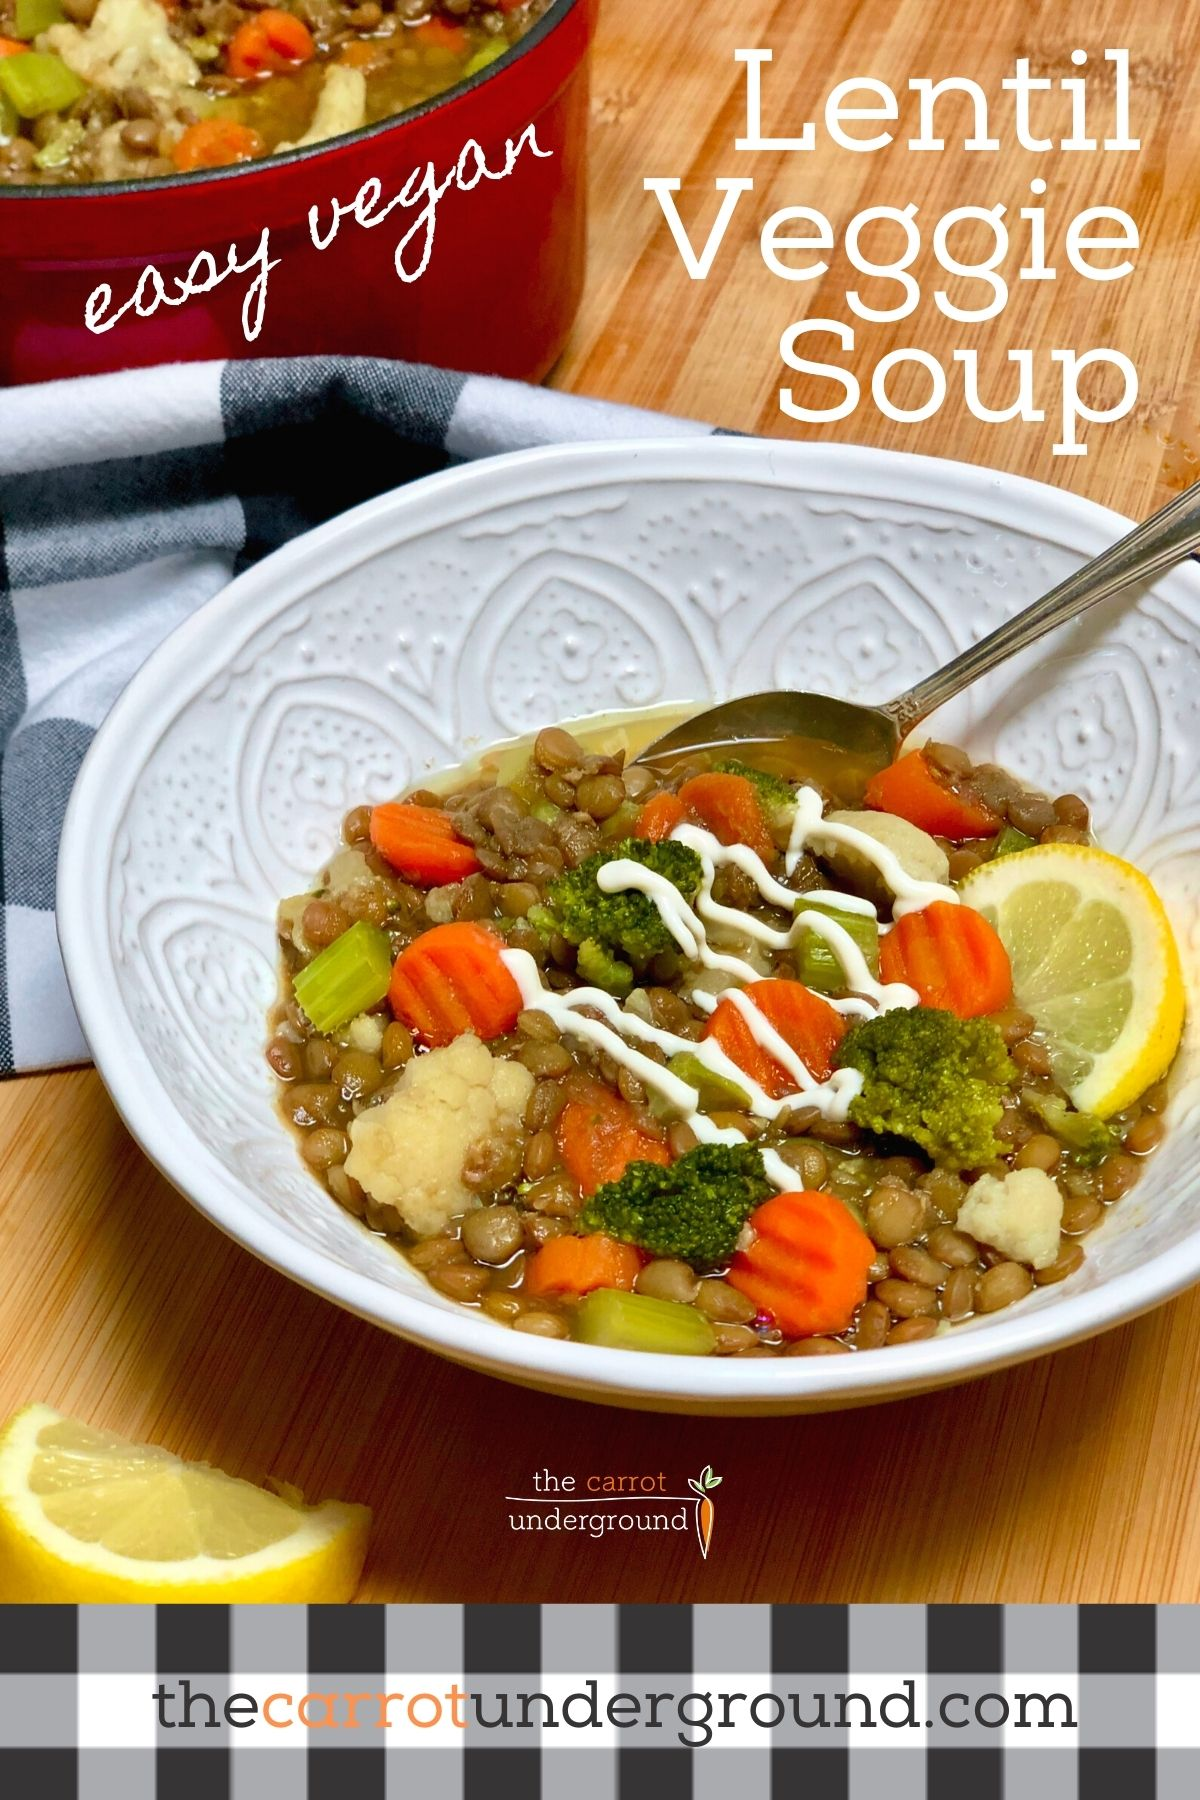 A bowl of easy vegan lentil veggie soup with a drizzle of plain vegan yogurt and lemon wedge.